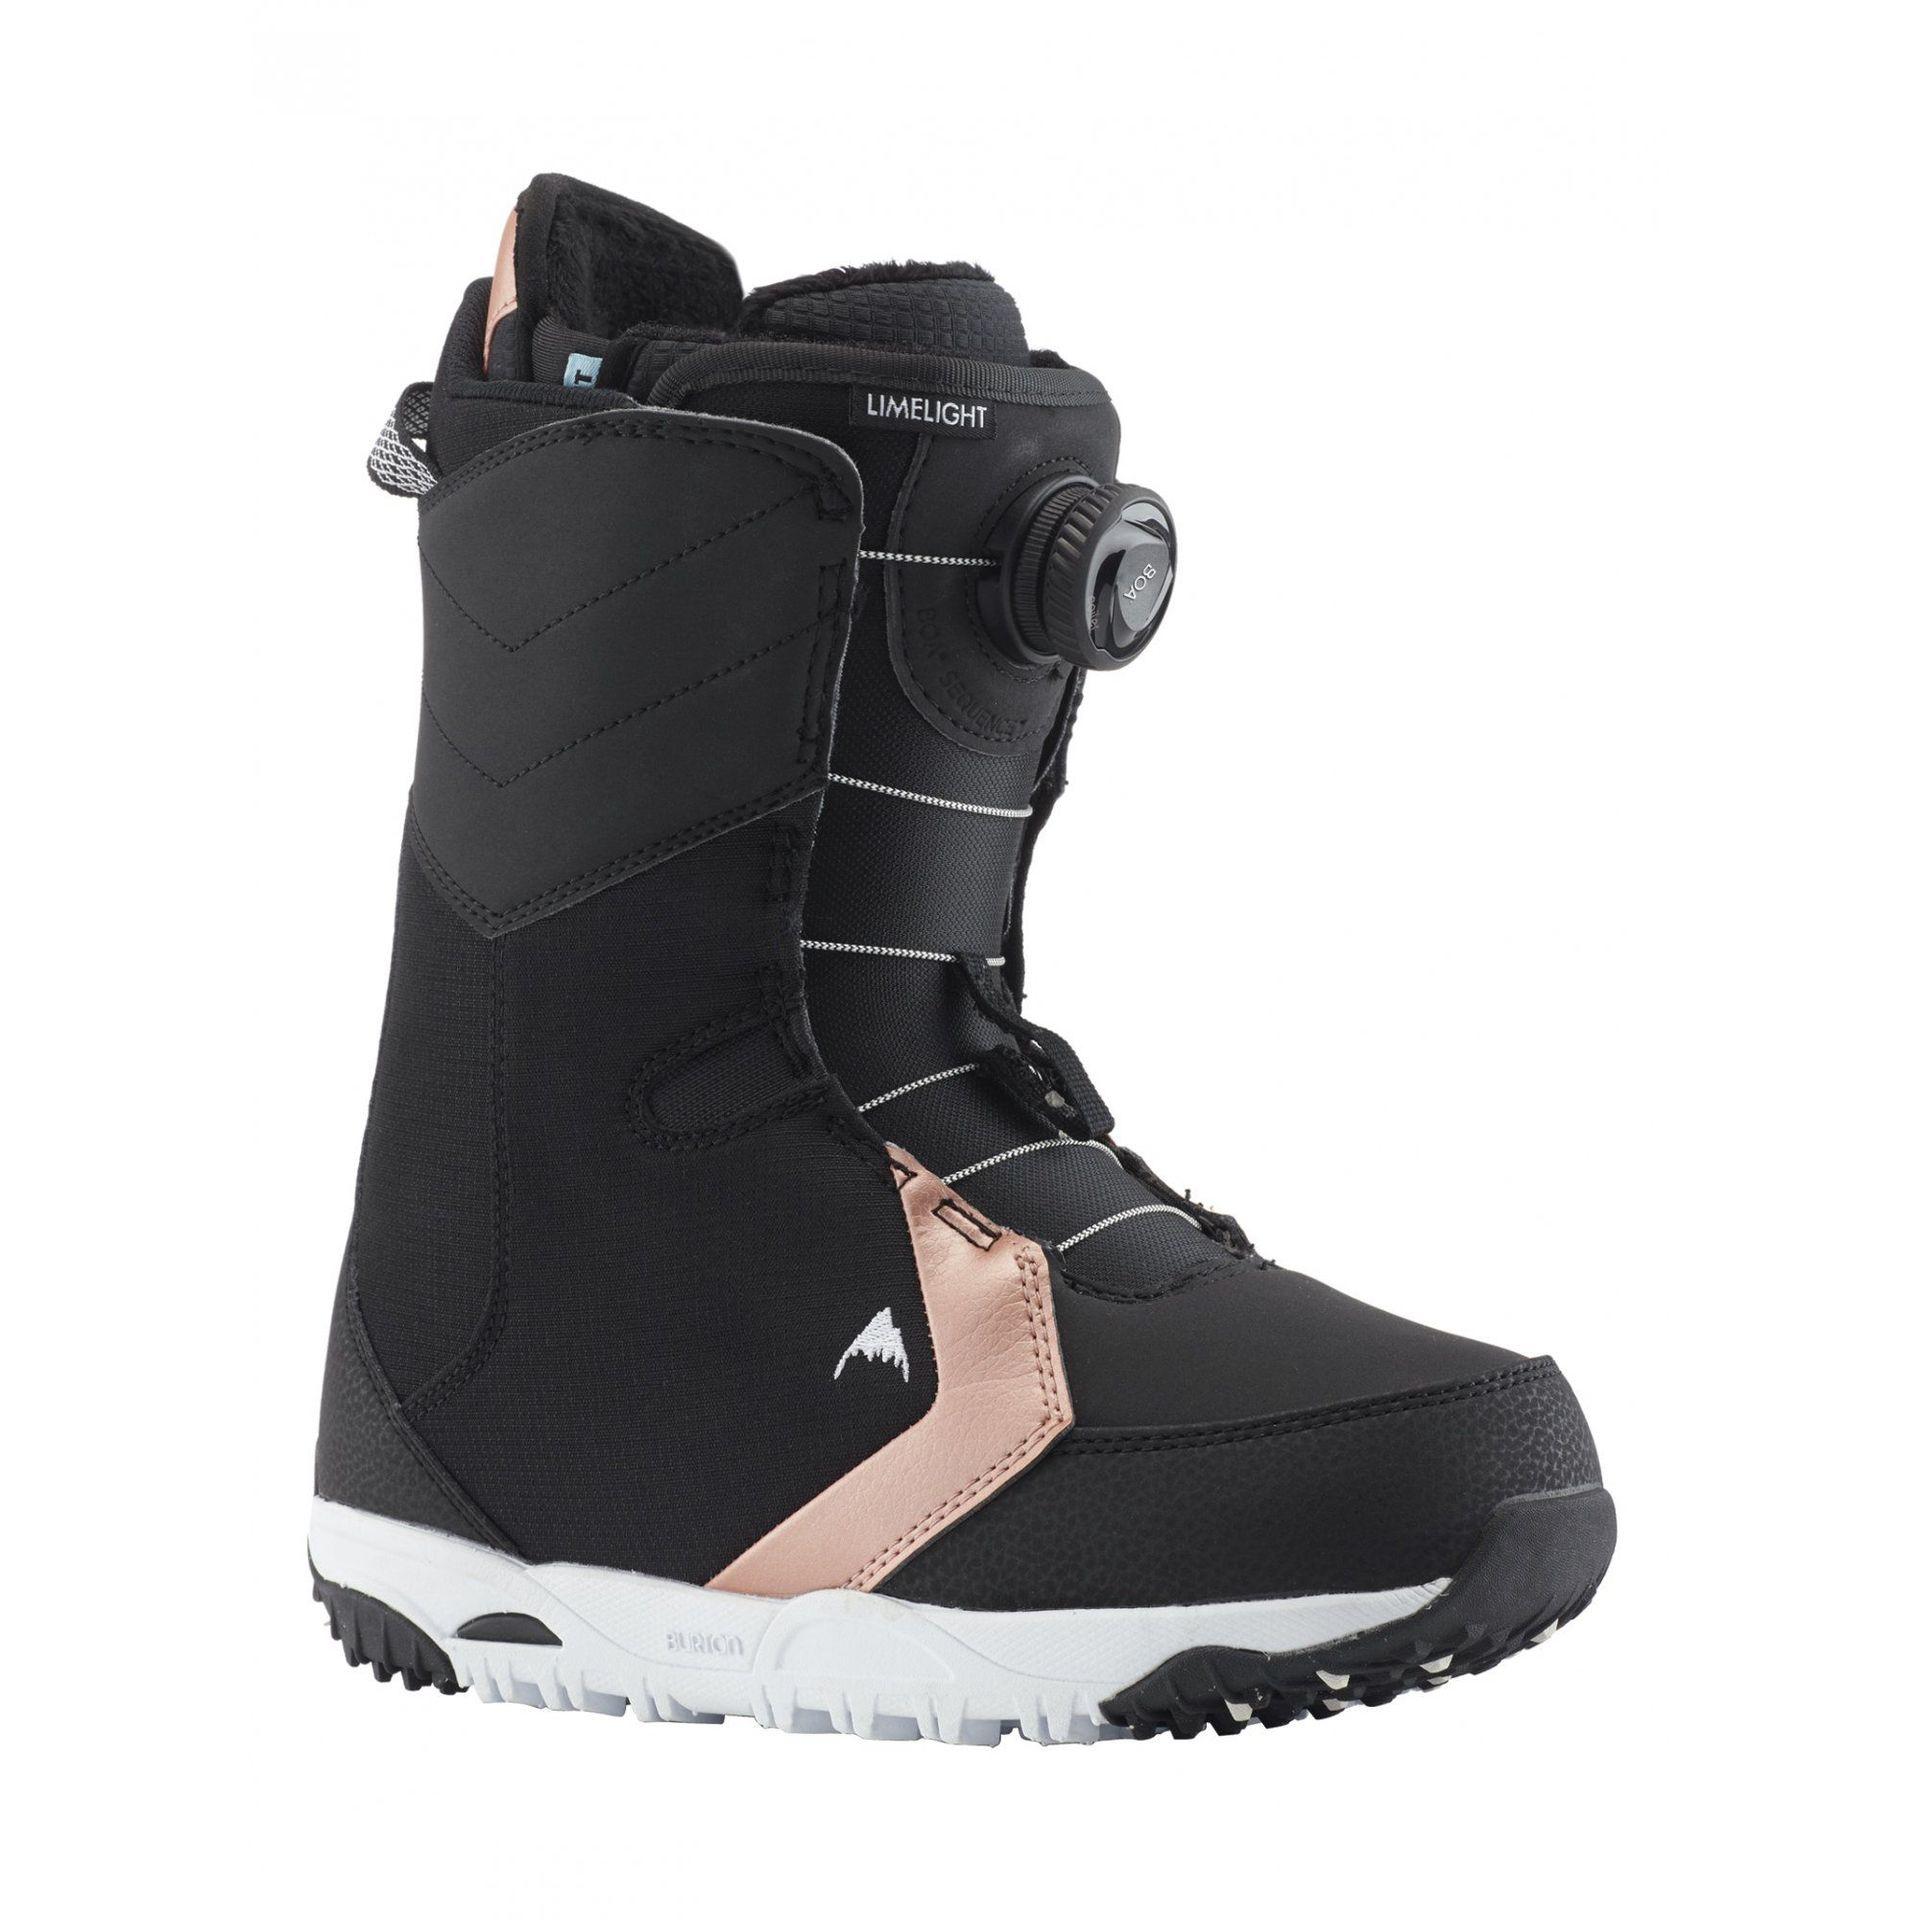 BUTY SNOWBOARDOWE BURTON LIMELIGHT BOA BLACK 150871-001 1